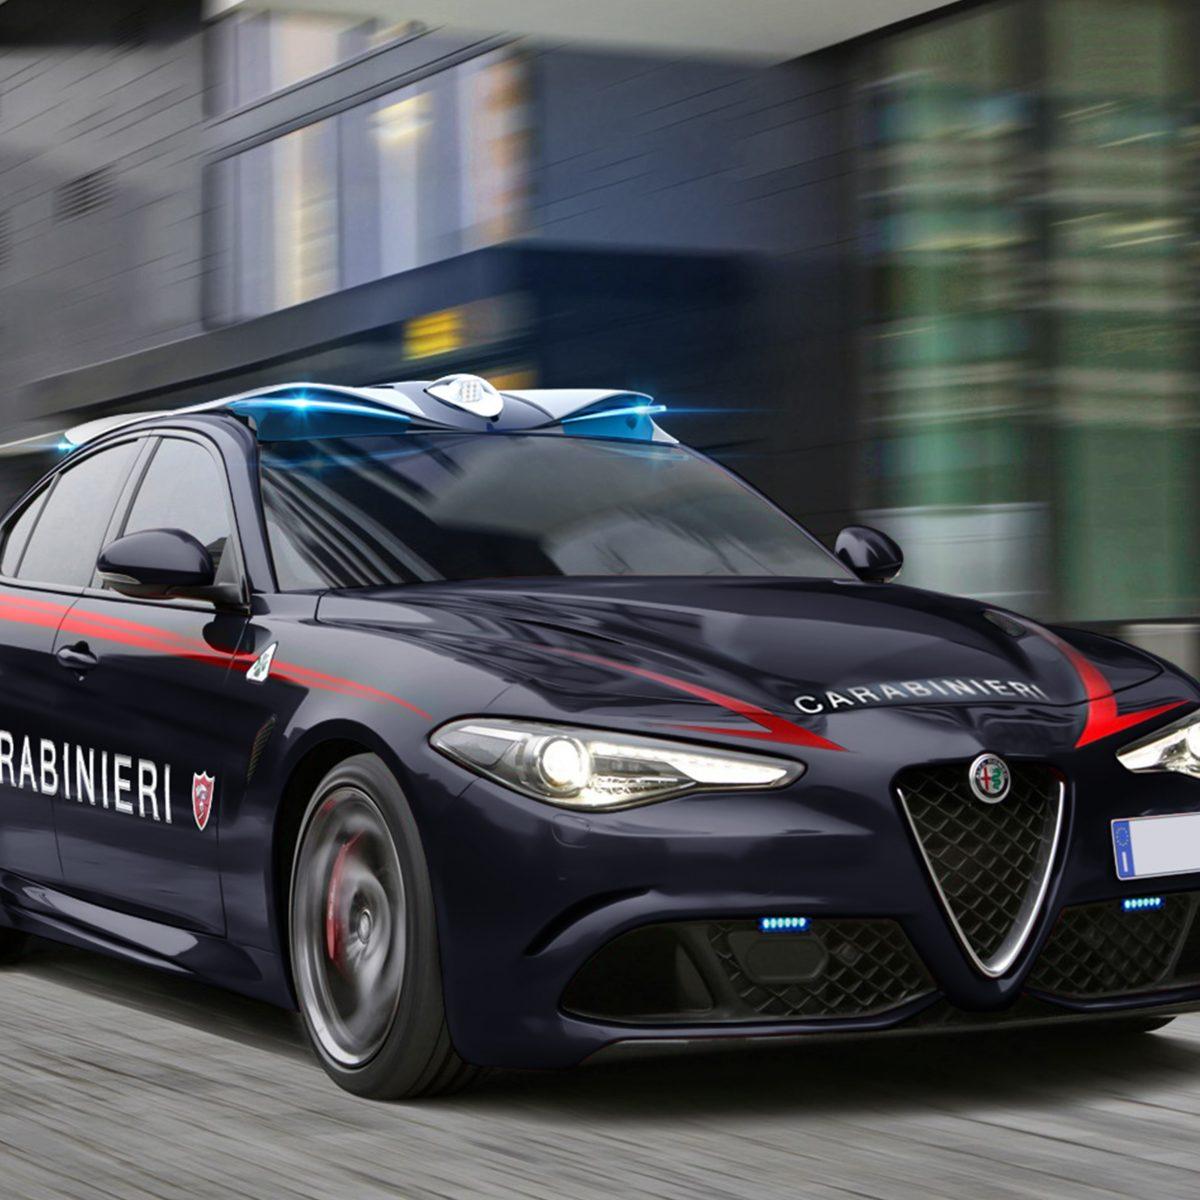 Alfa Giulia quadrifoglio verde carabinieri